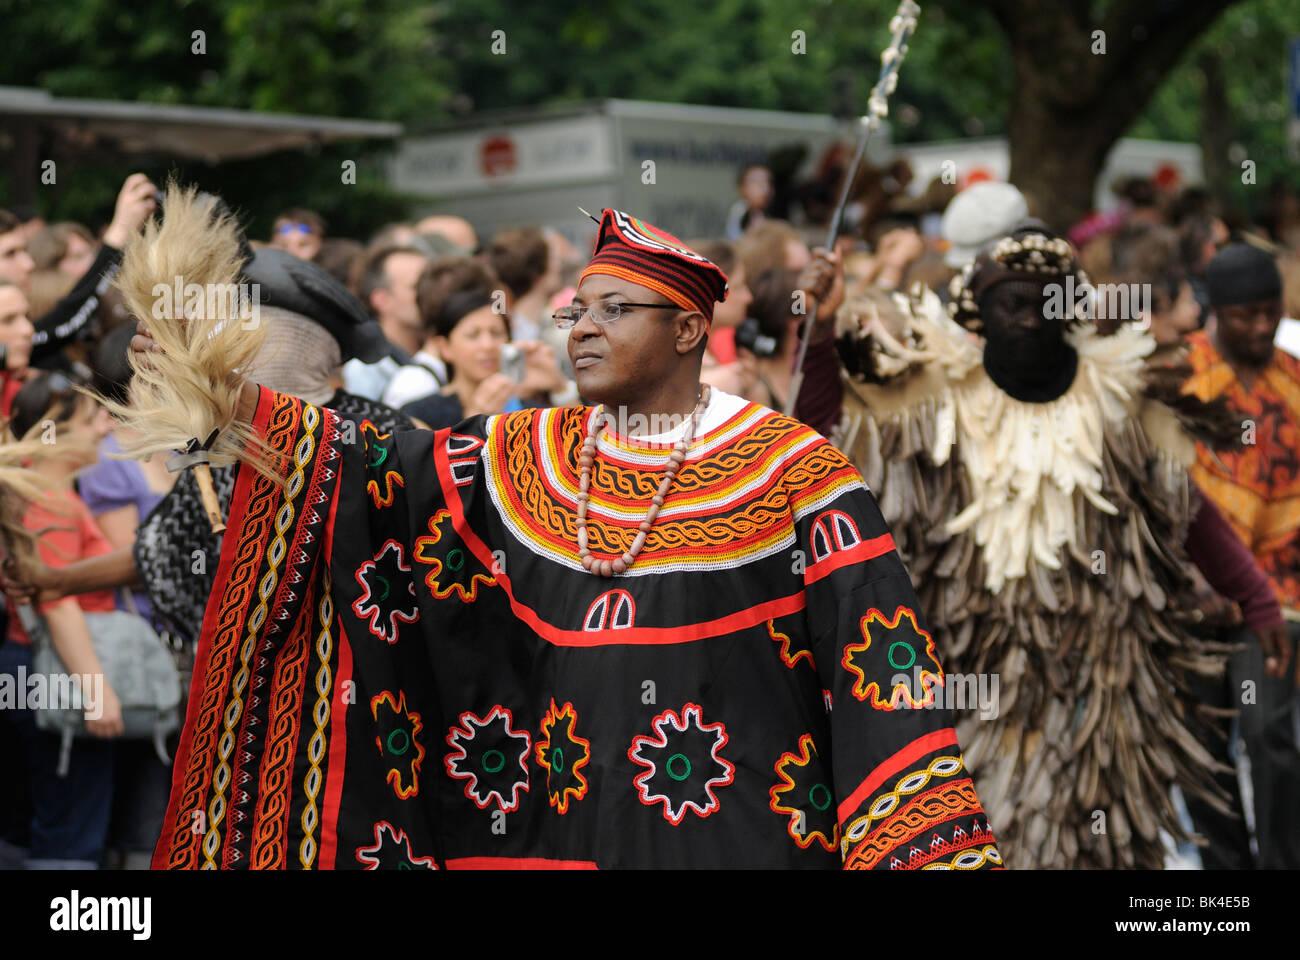 Karneval der Kulturen, Carnival of Cultures, annual famous street parade on Whitsun, Kreuzberg district, Berlin, - Stock Image